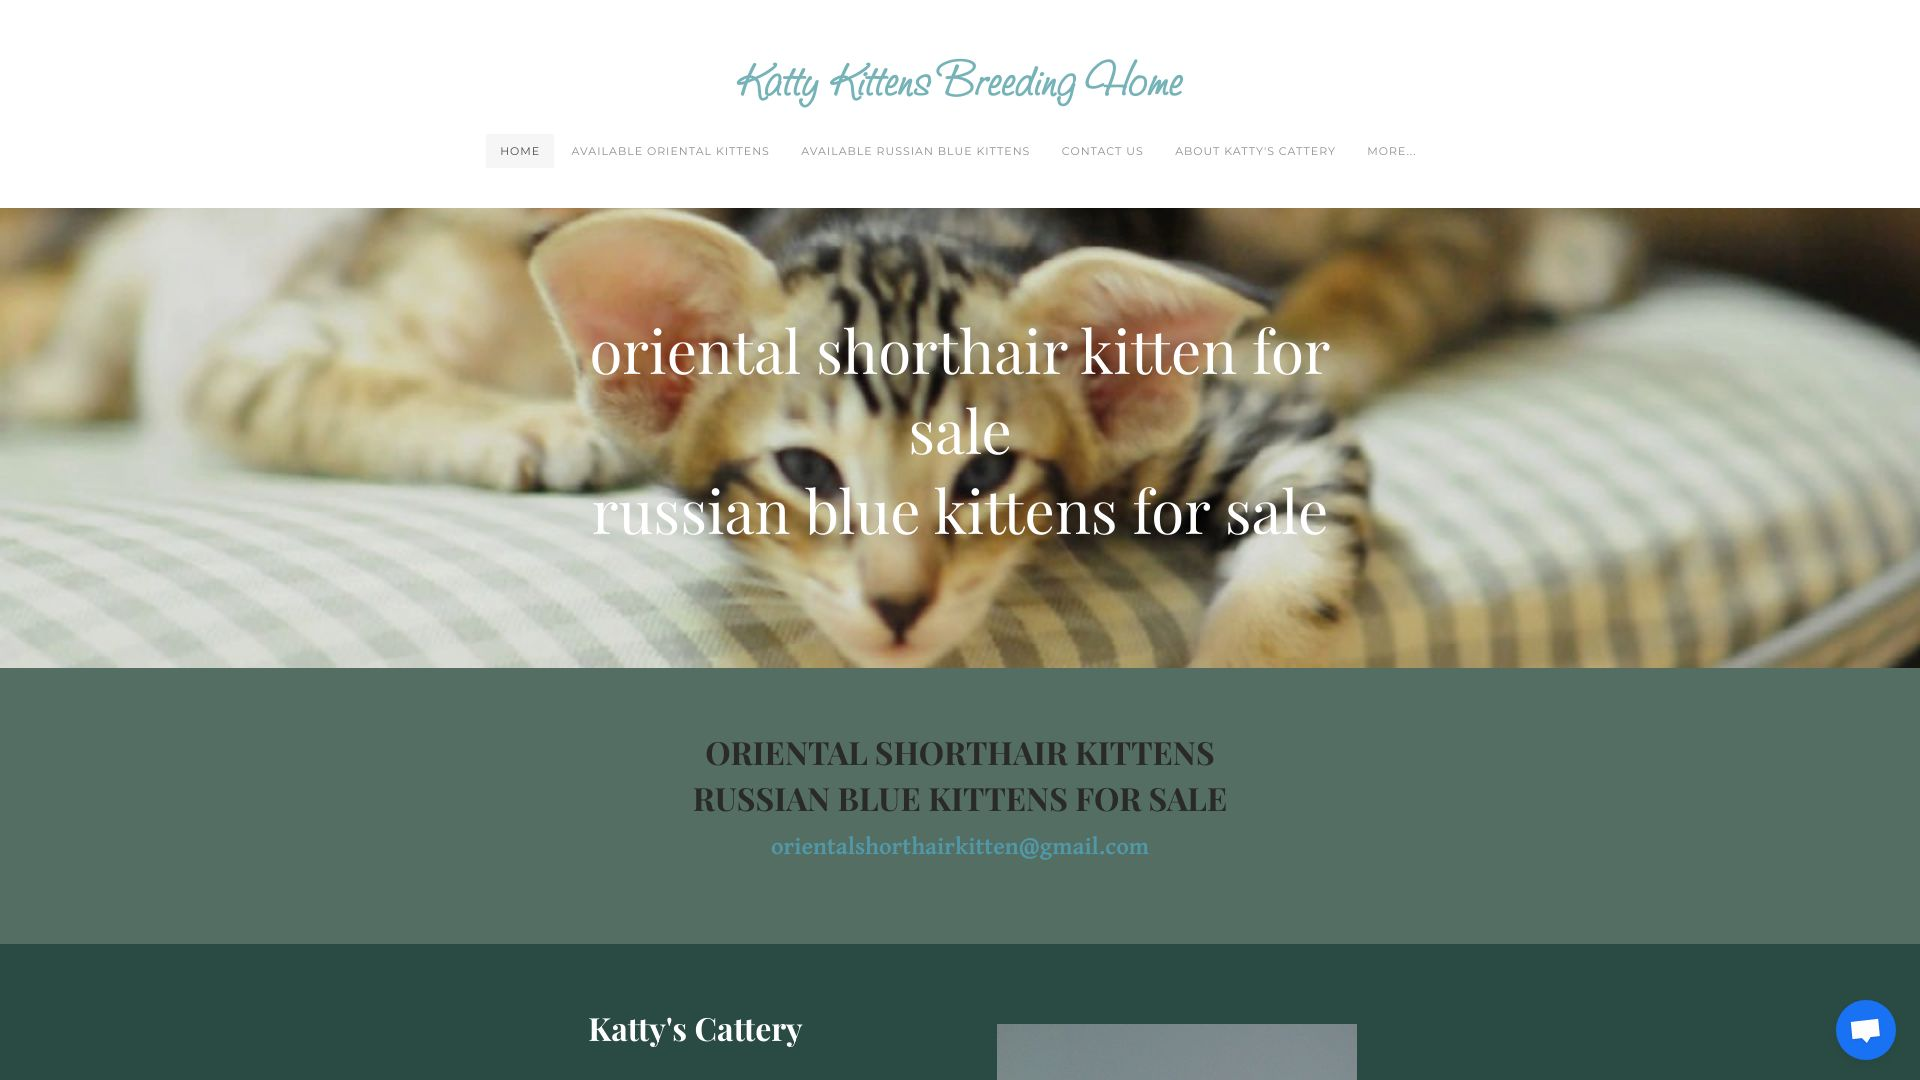 orientalshorthair.company.com